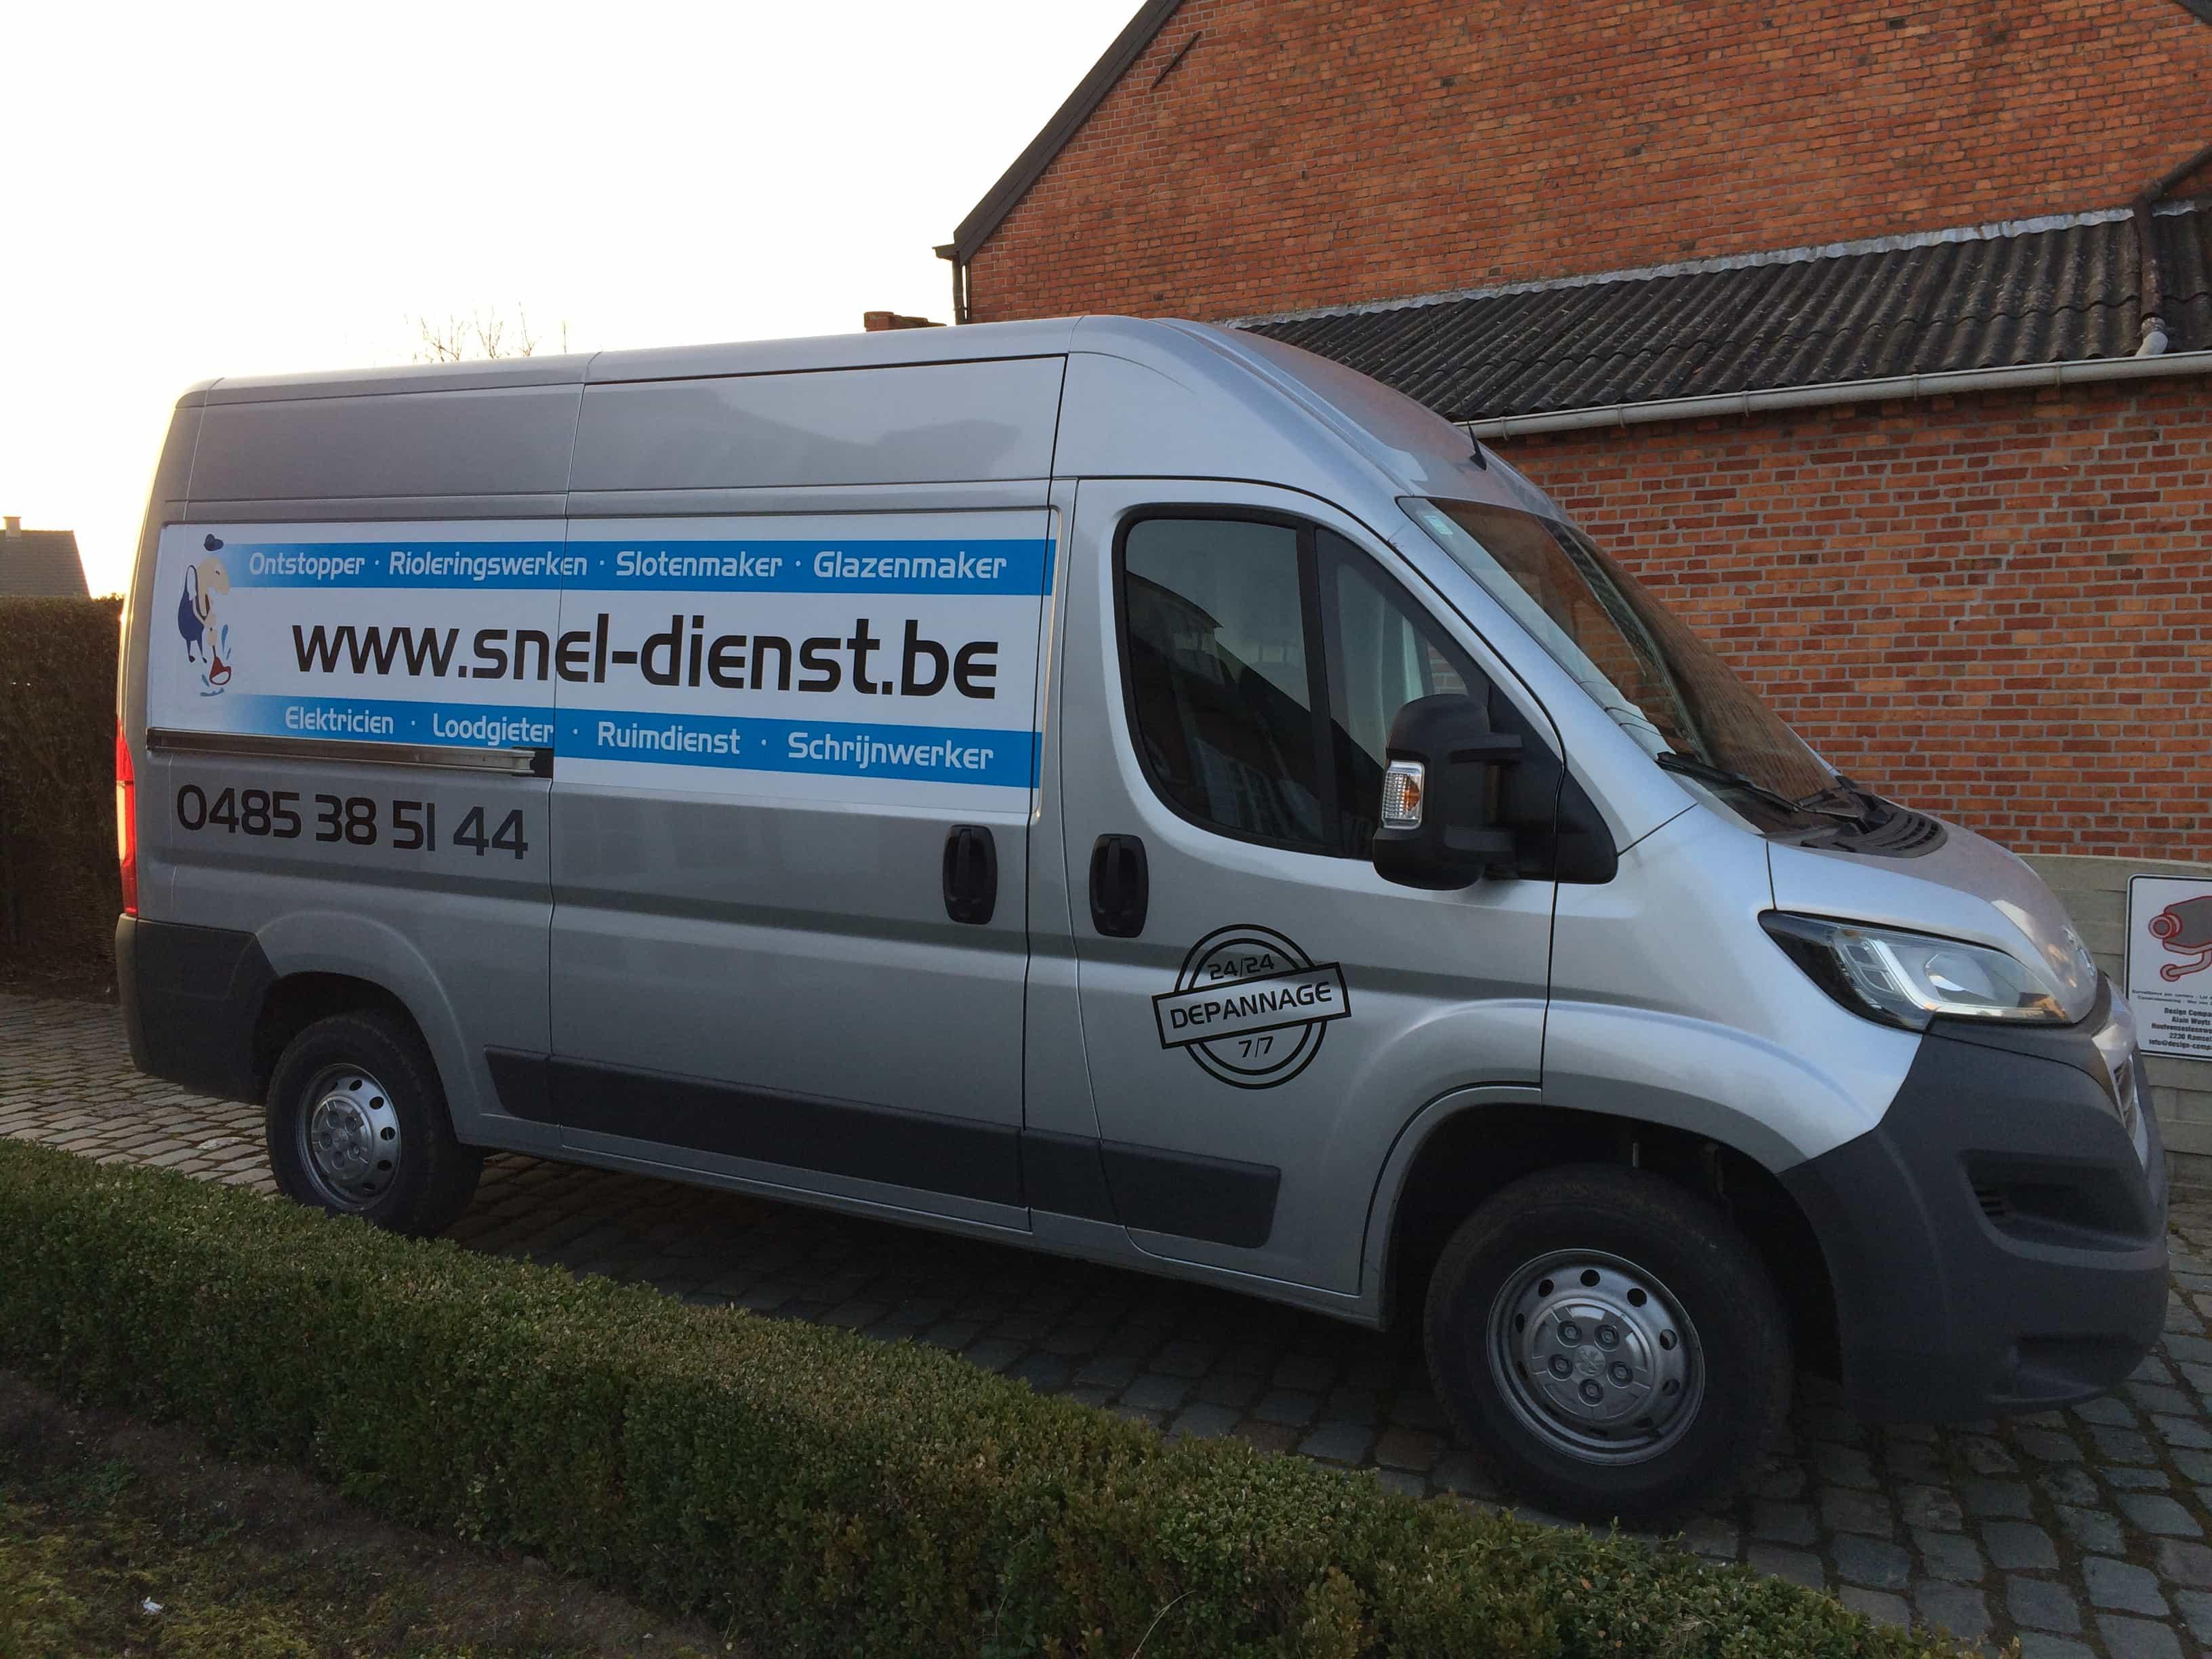 Autobelettering snel-dienst.be